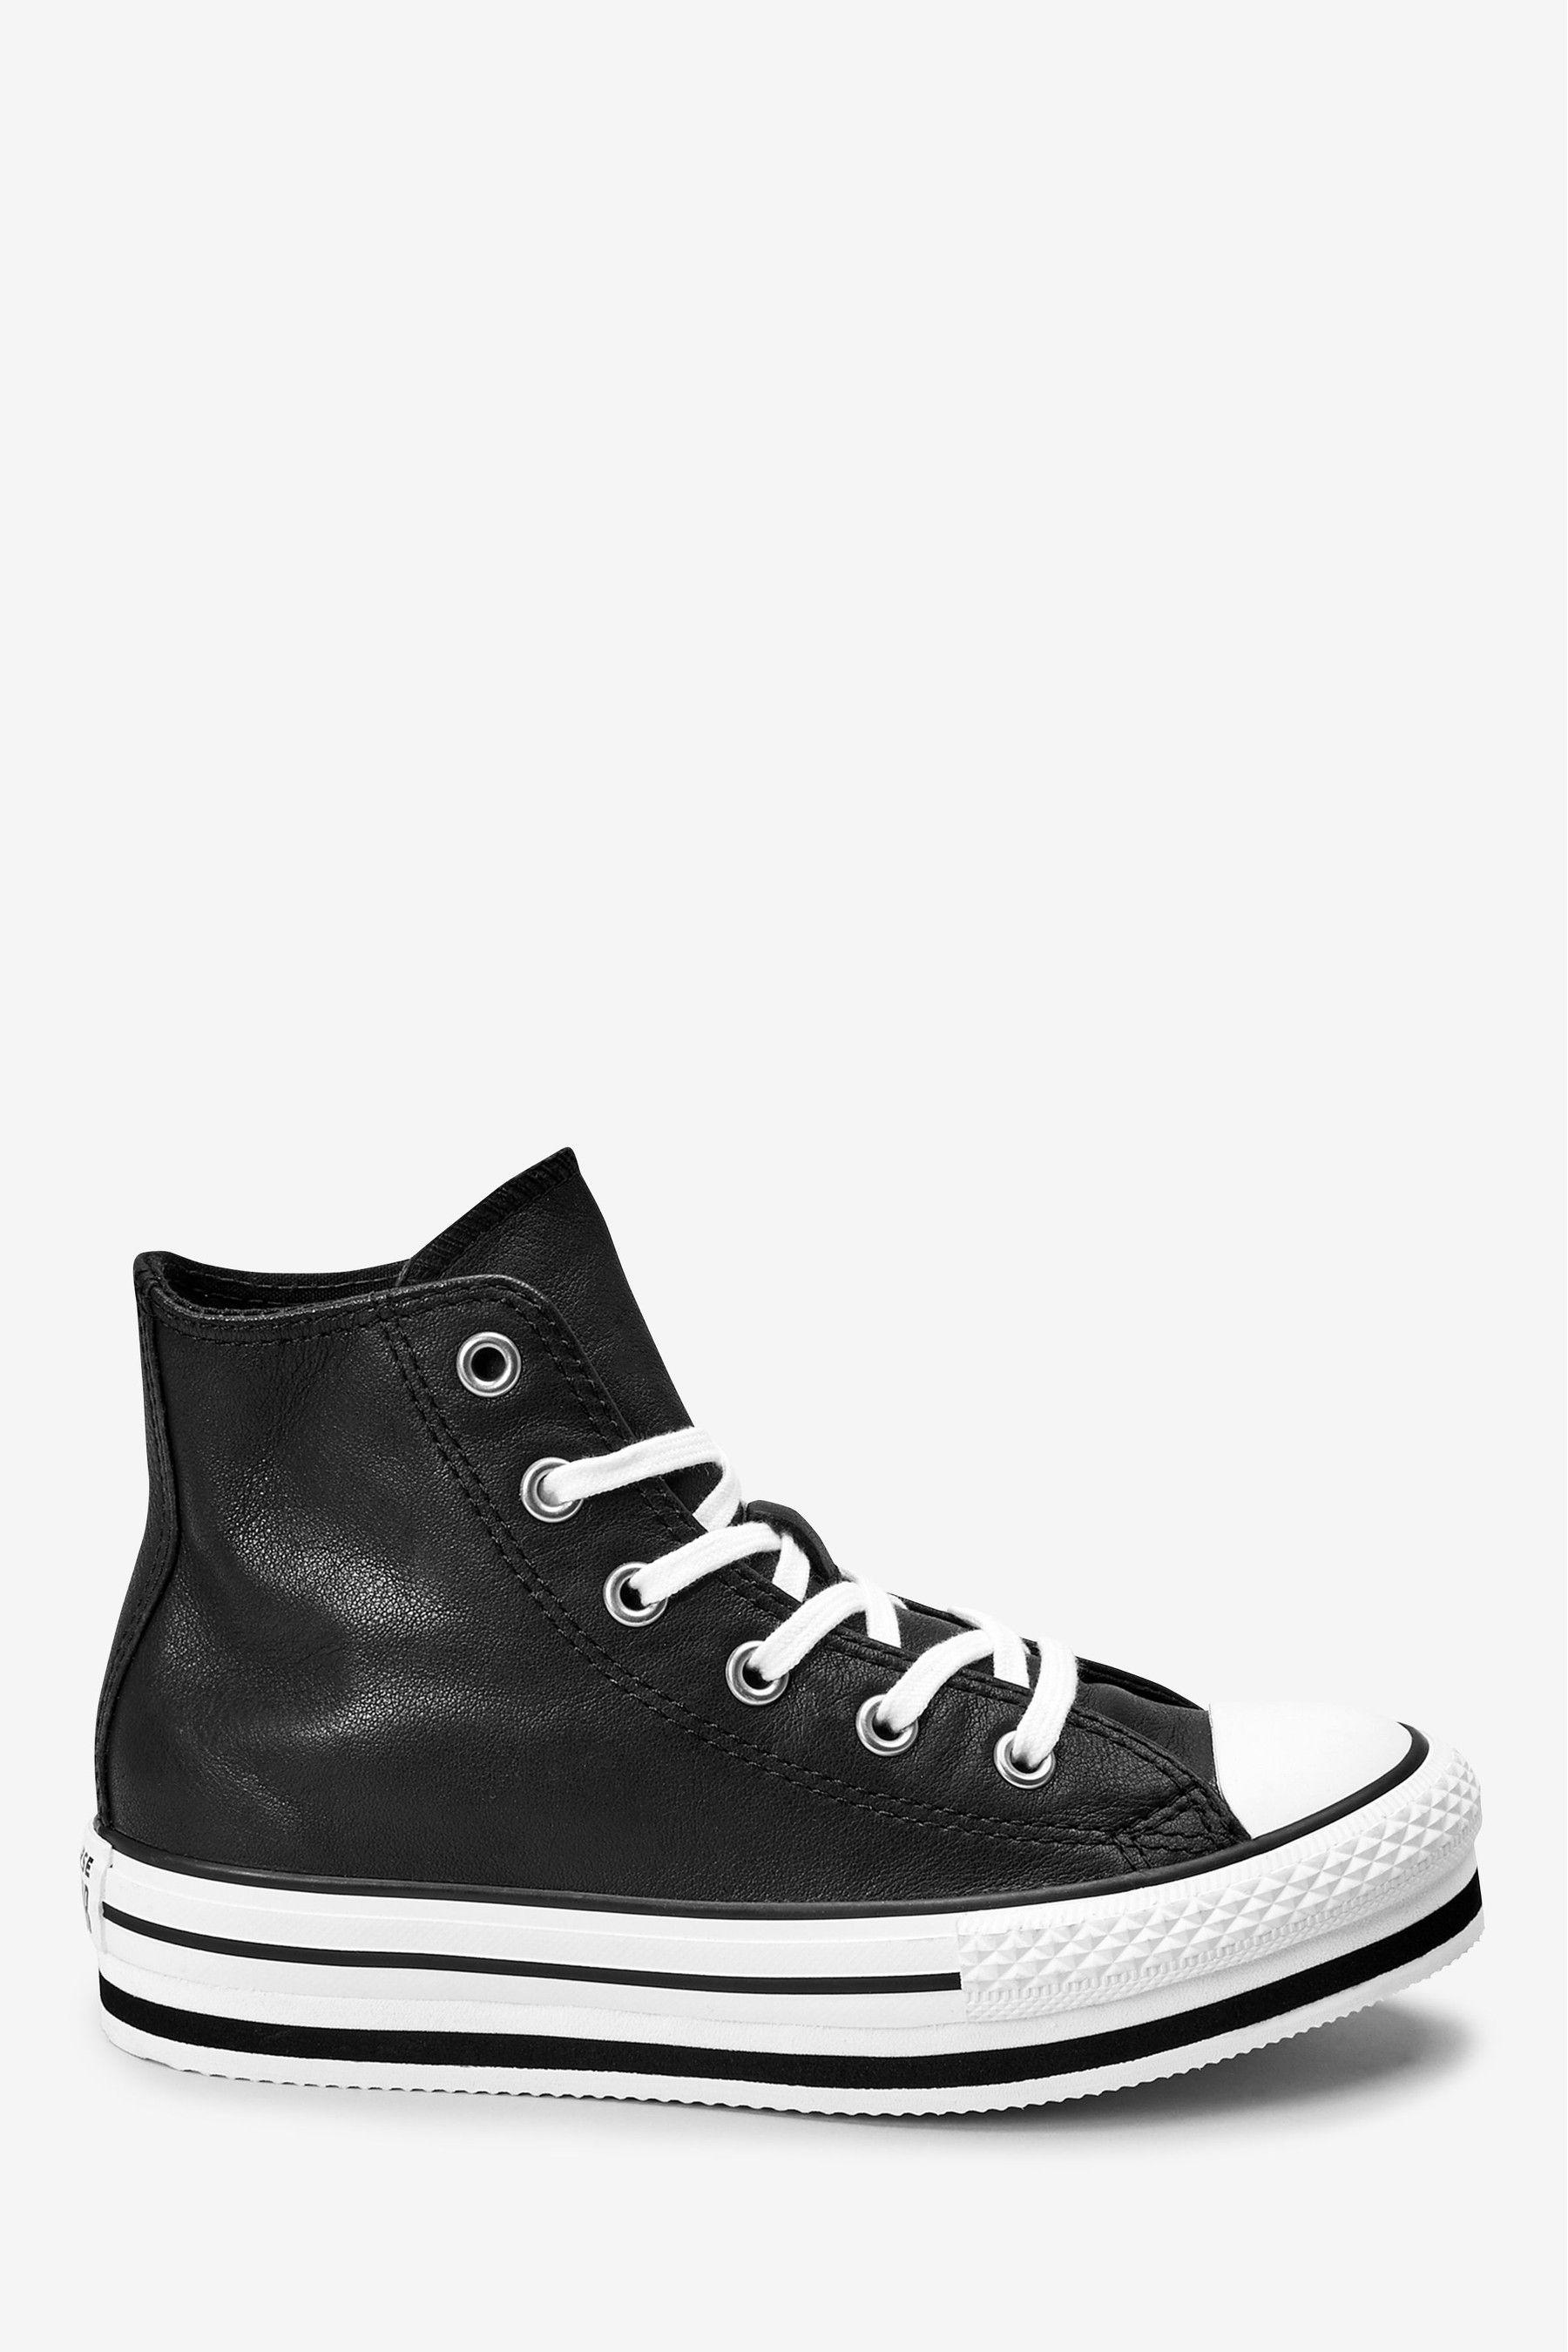 converse Chuck Taylor All Star EASY SLIP (youthjunior)